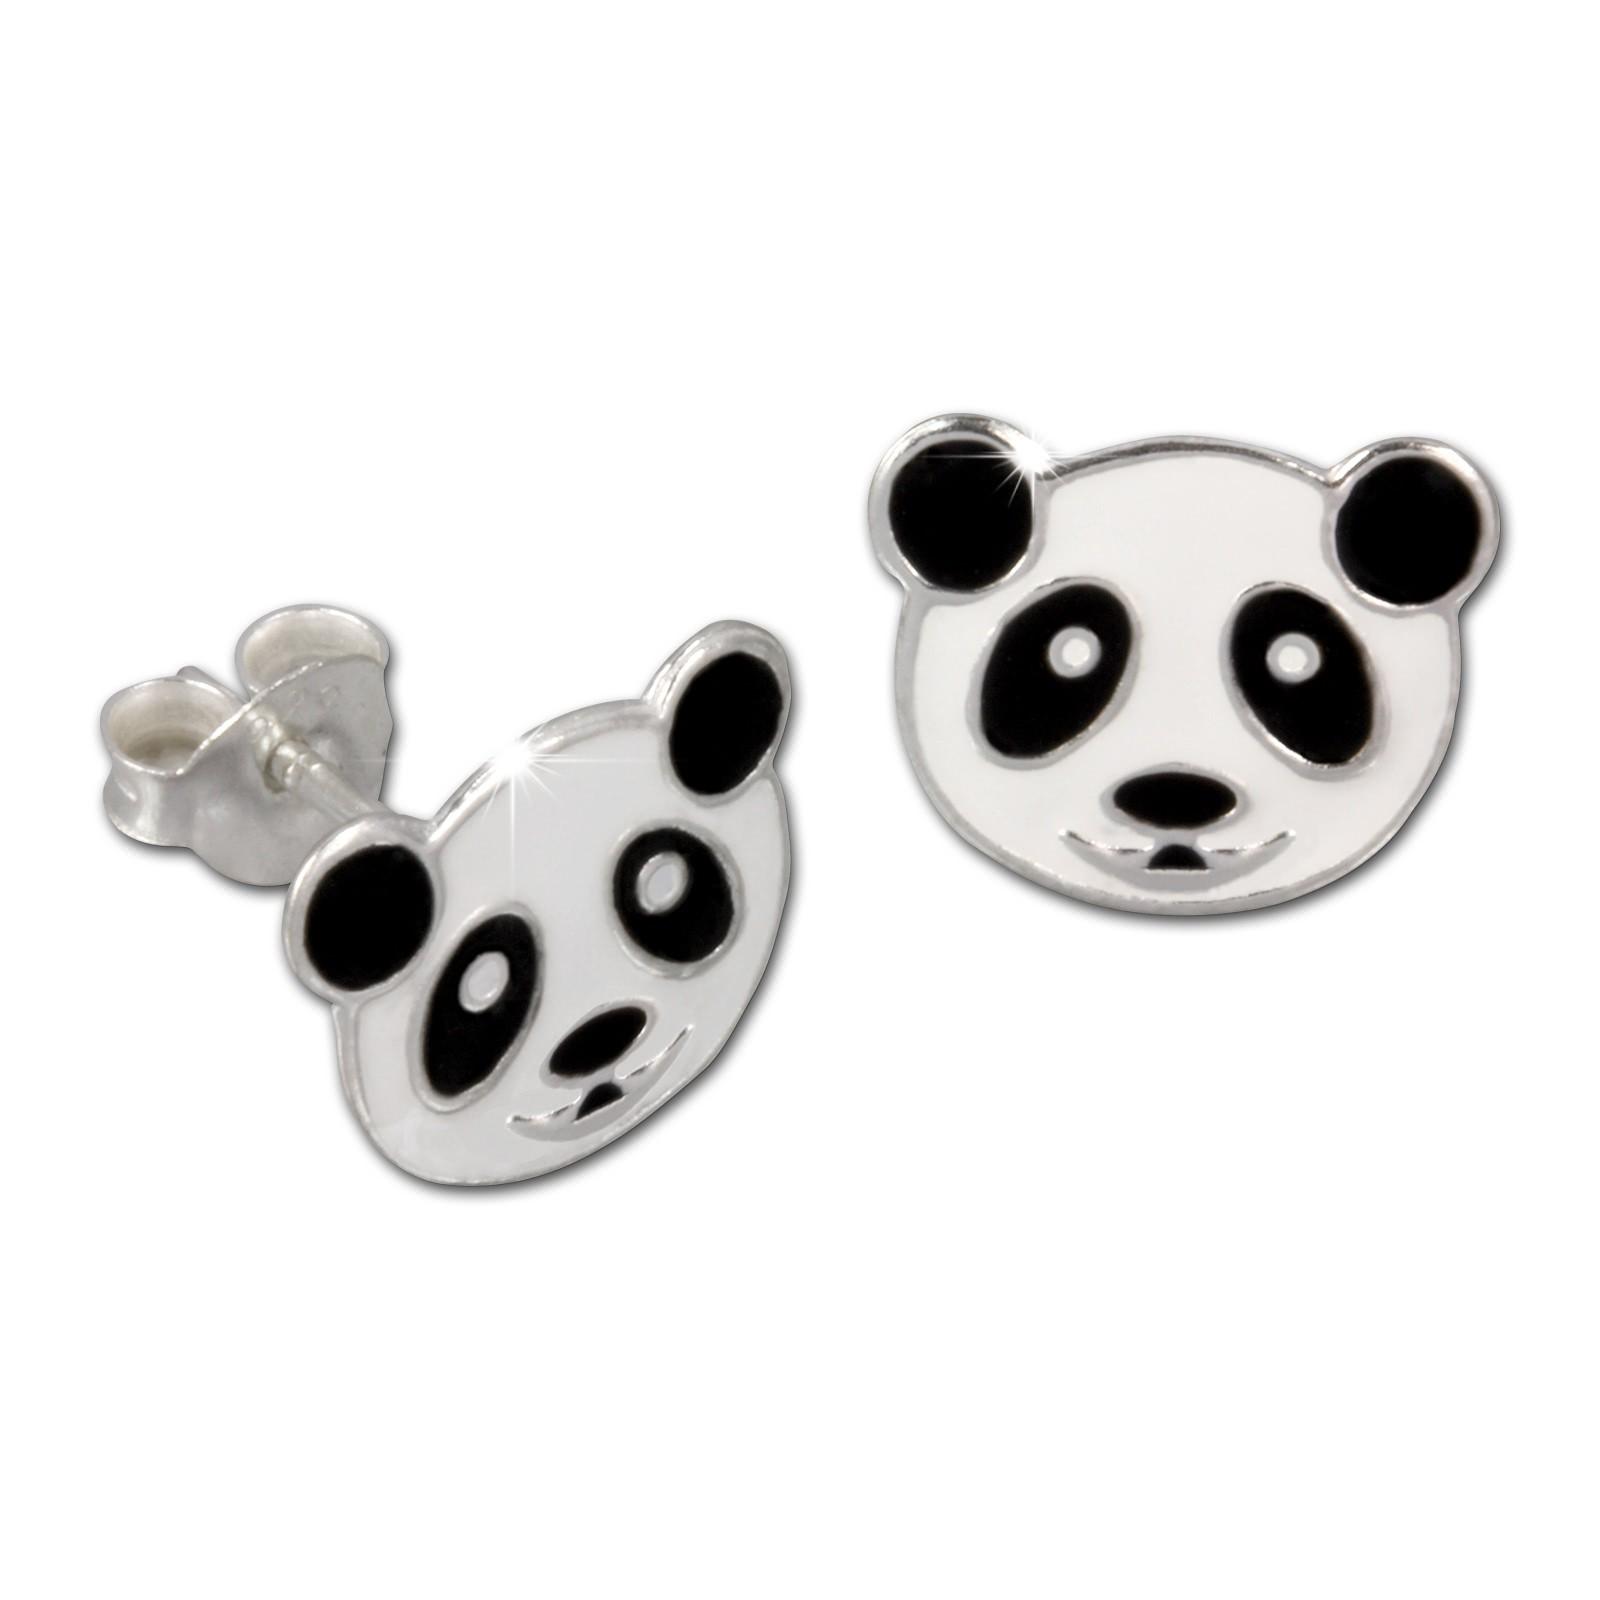 Kinder Ohrring Panda weiß Silber Ohrstecker Kinderschmuck TW SDO8103W